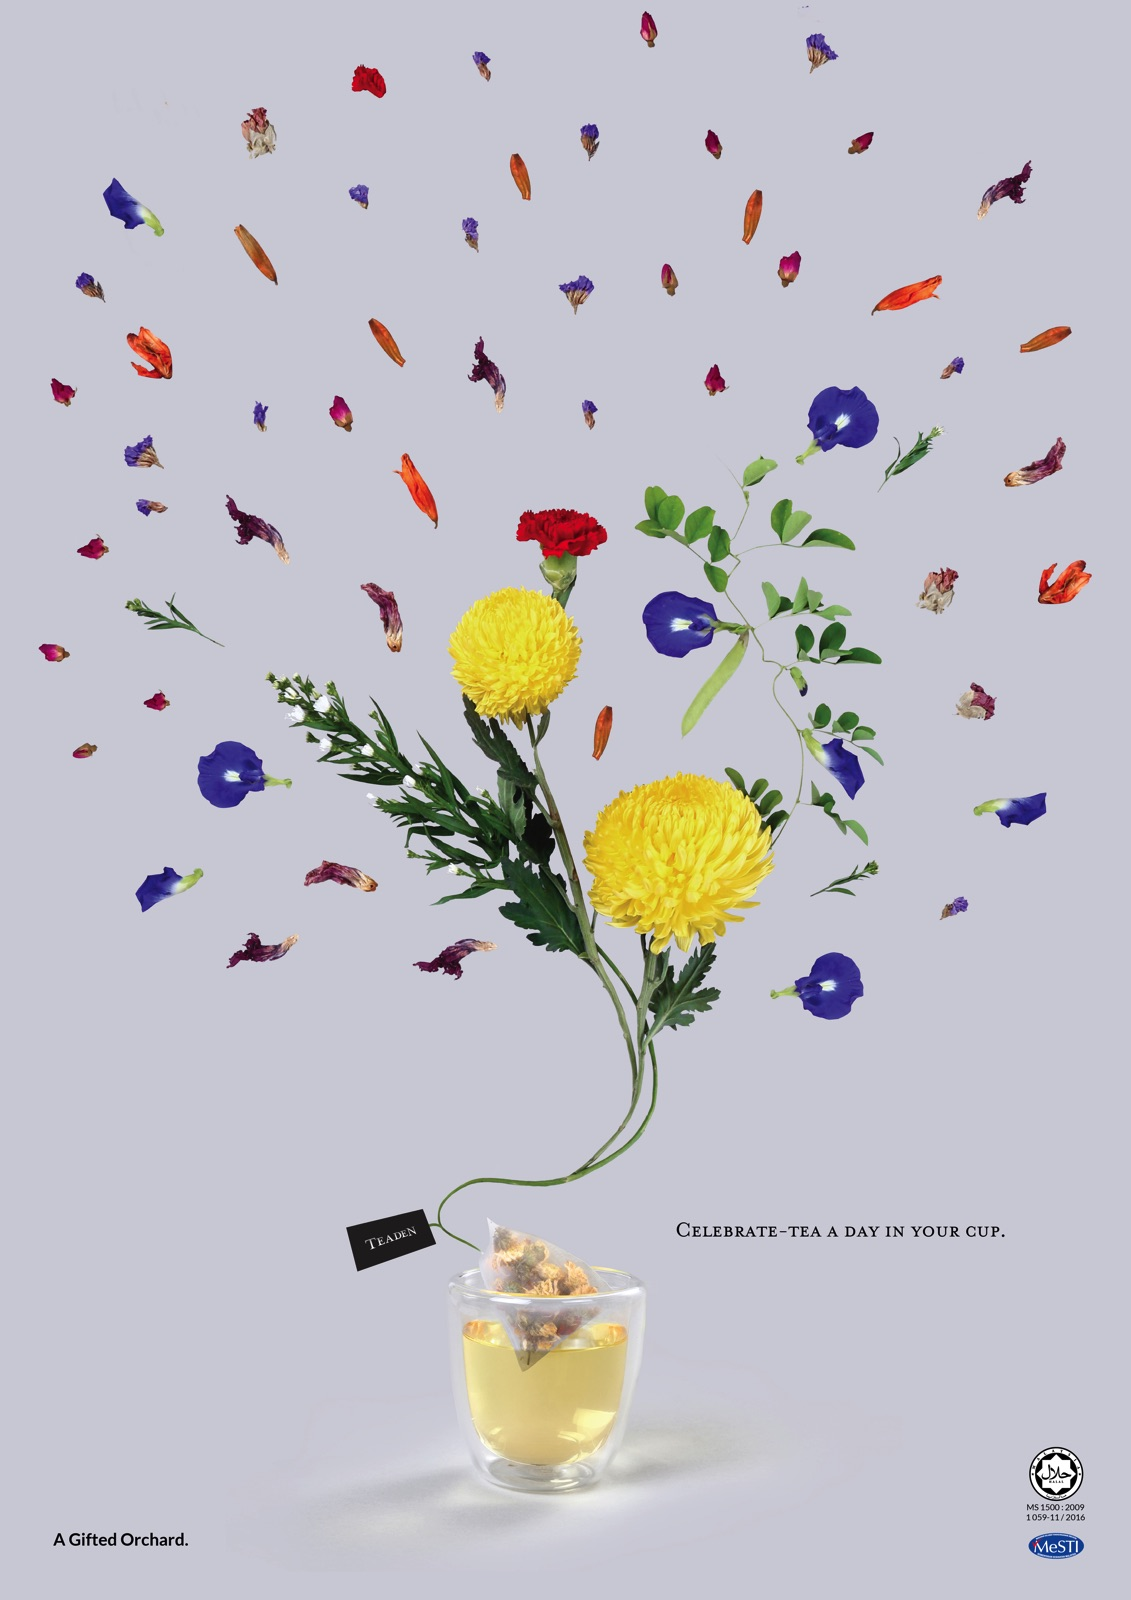 Teaden Print Advert By At Home Creative: Teaden\'s Life Cerebrations ...